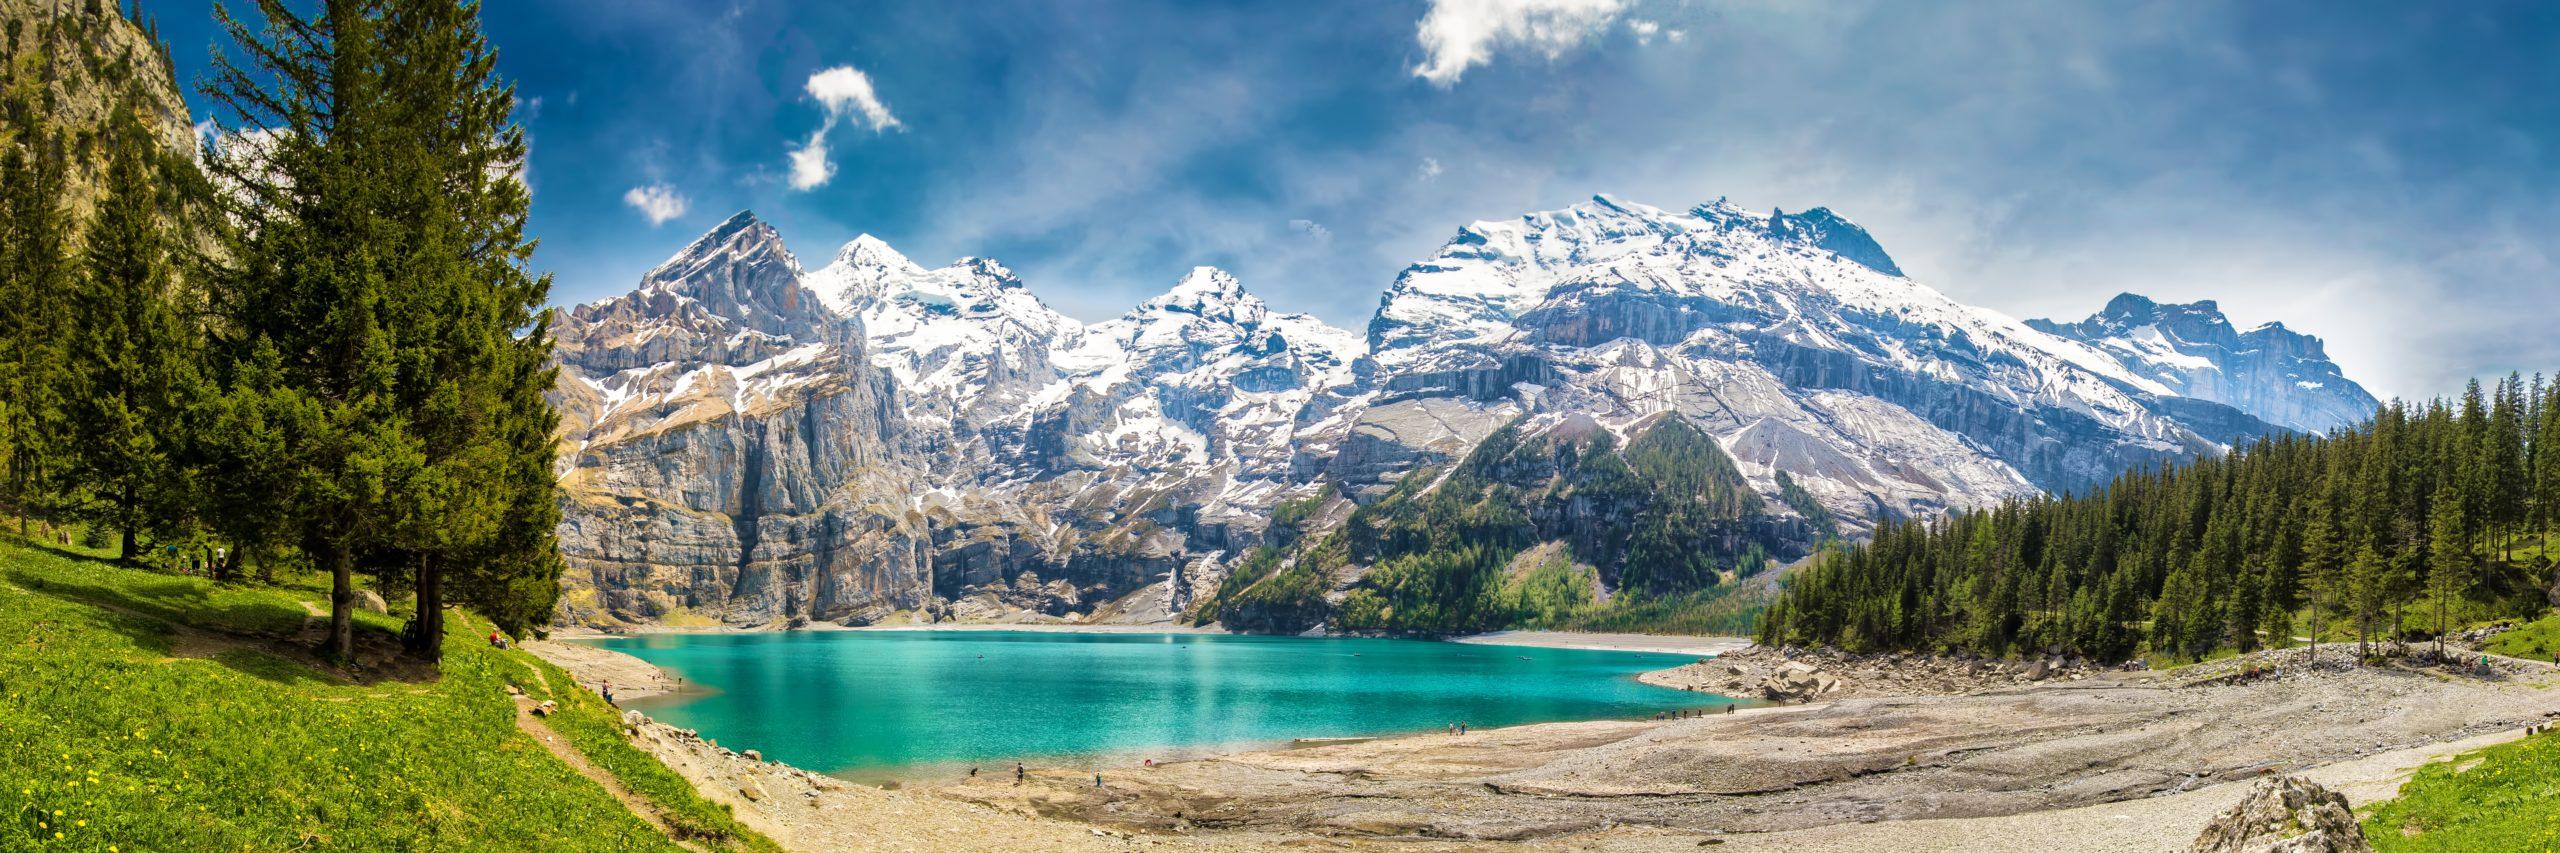 Switzerland [Shutterstock]